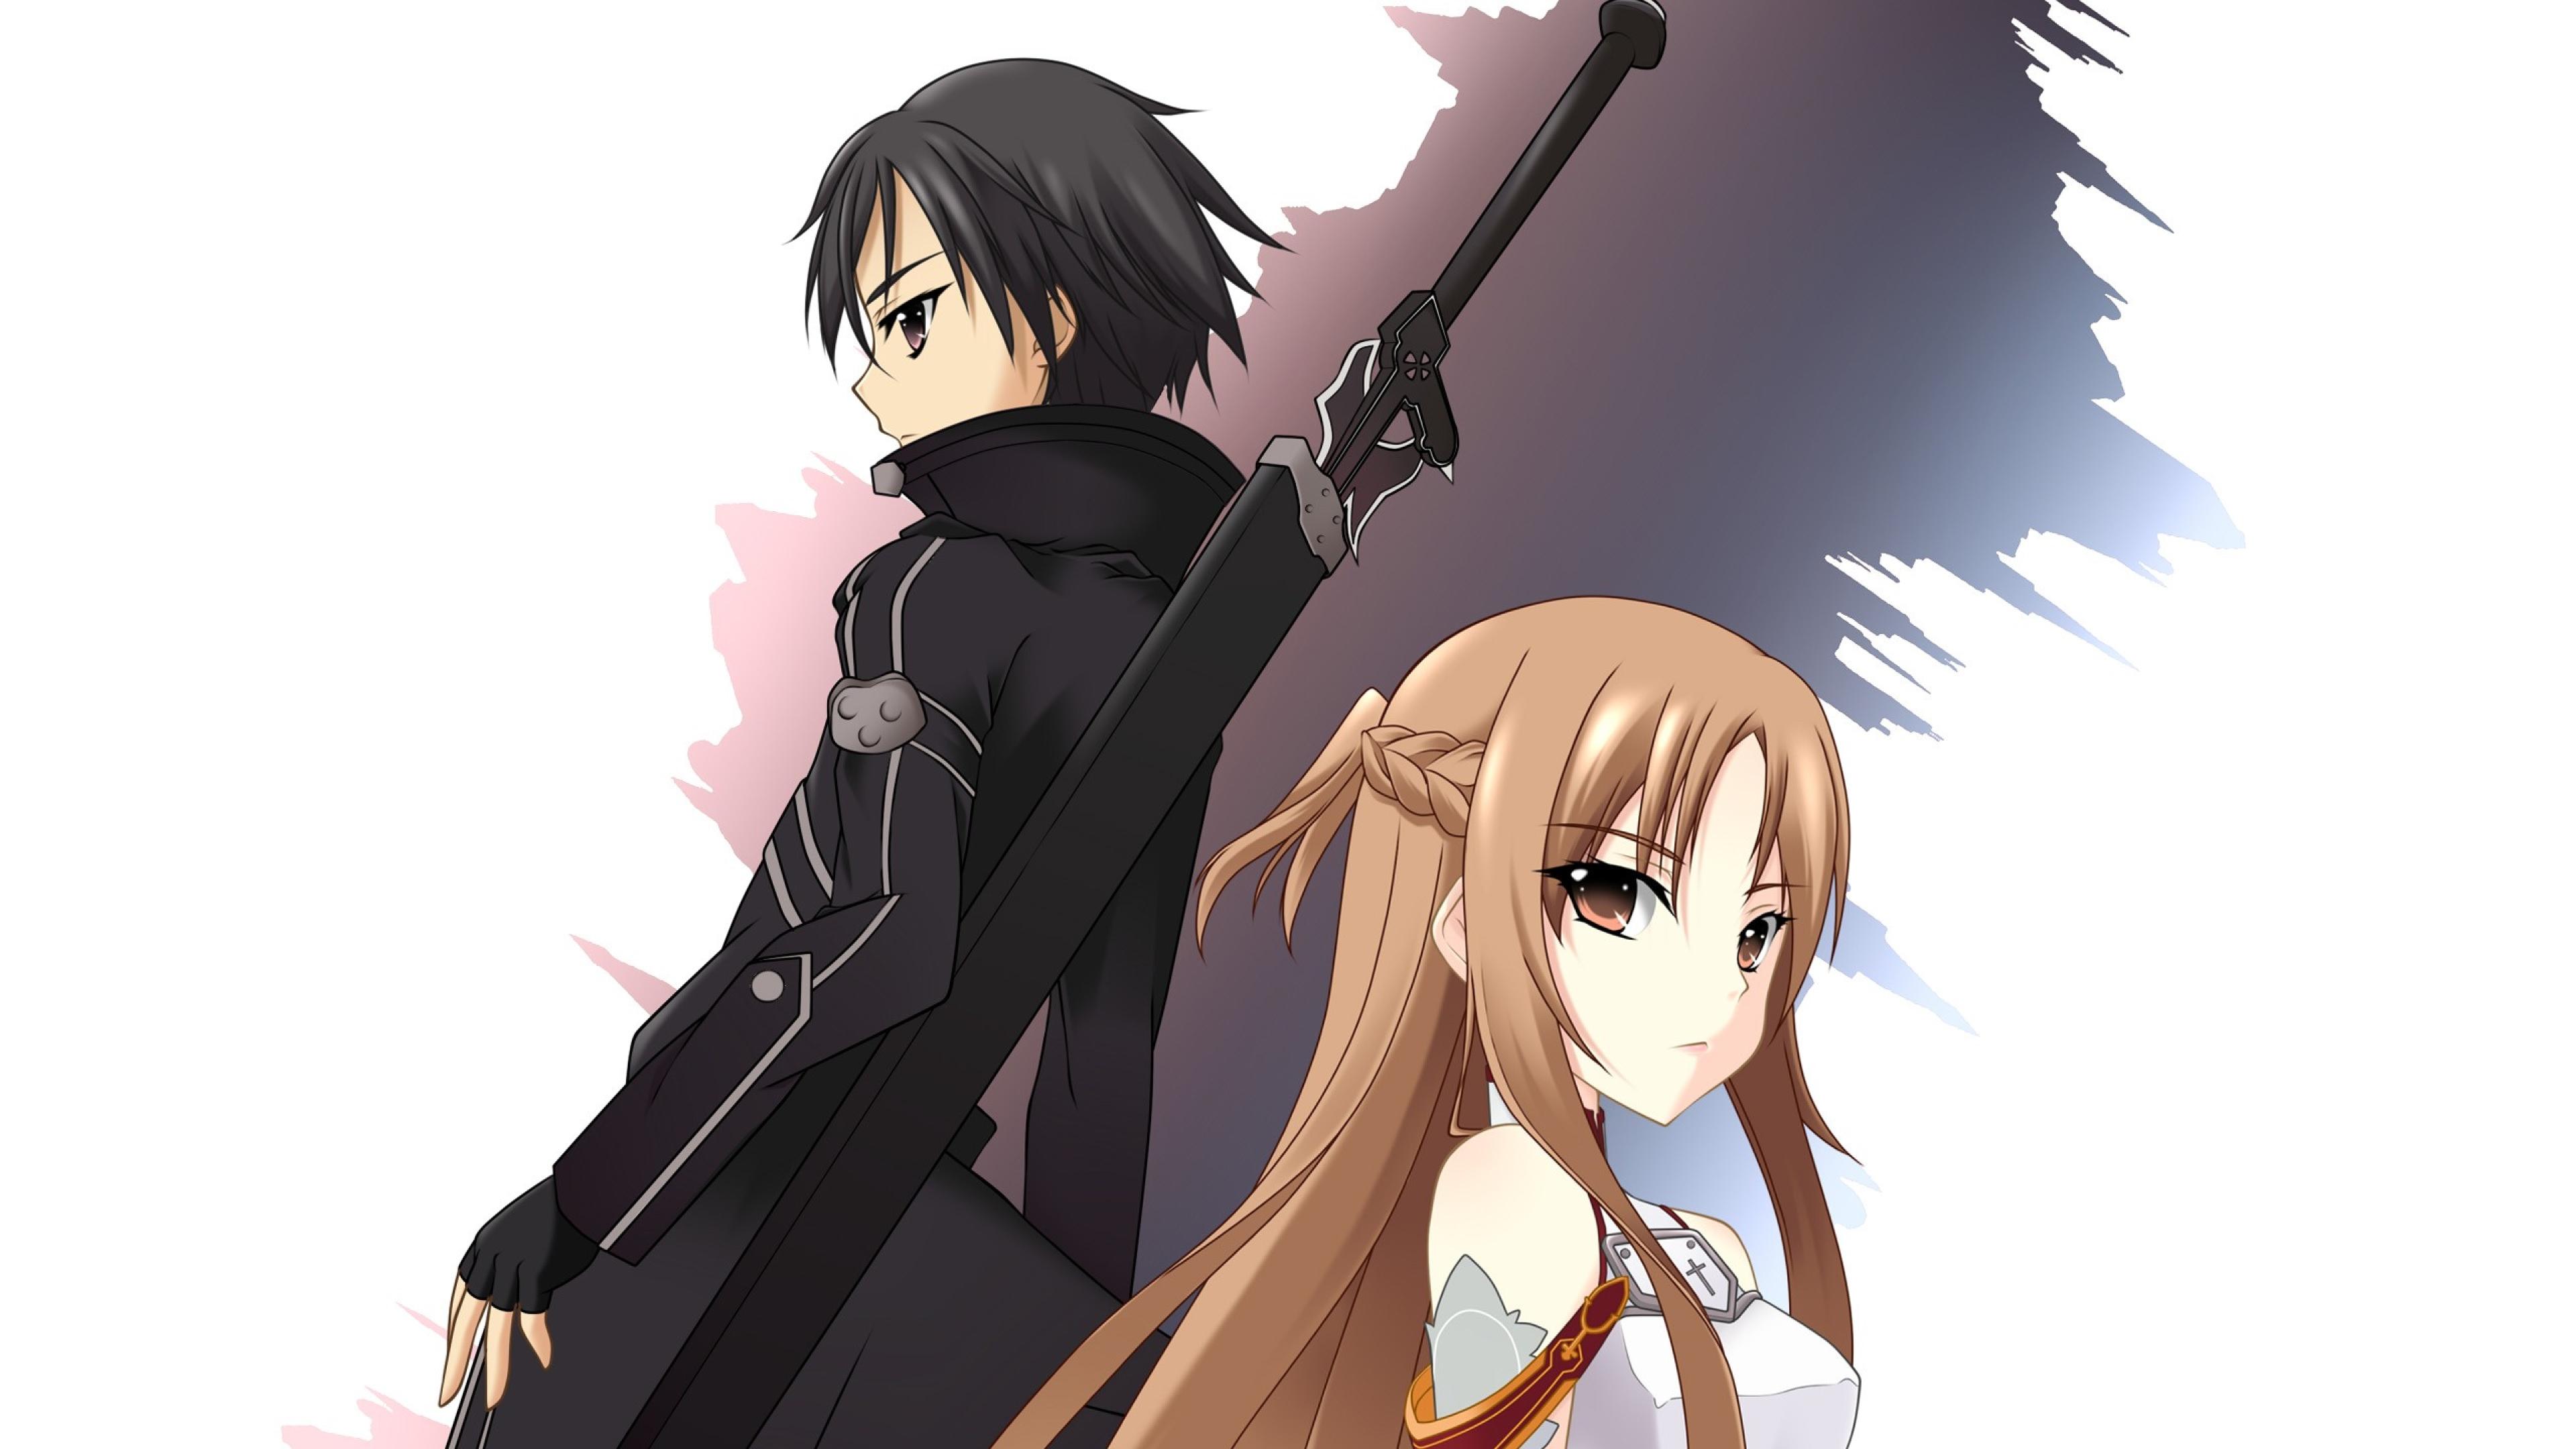 3840x2160 Sword Art Online Asuna Yuuki Kazuto Kirigaya 4k